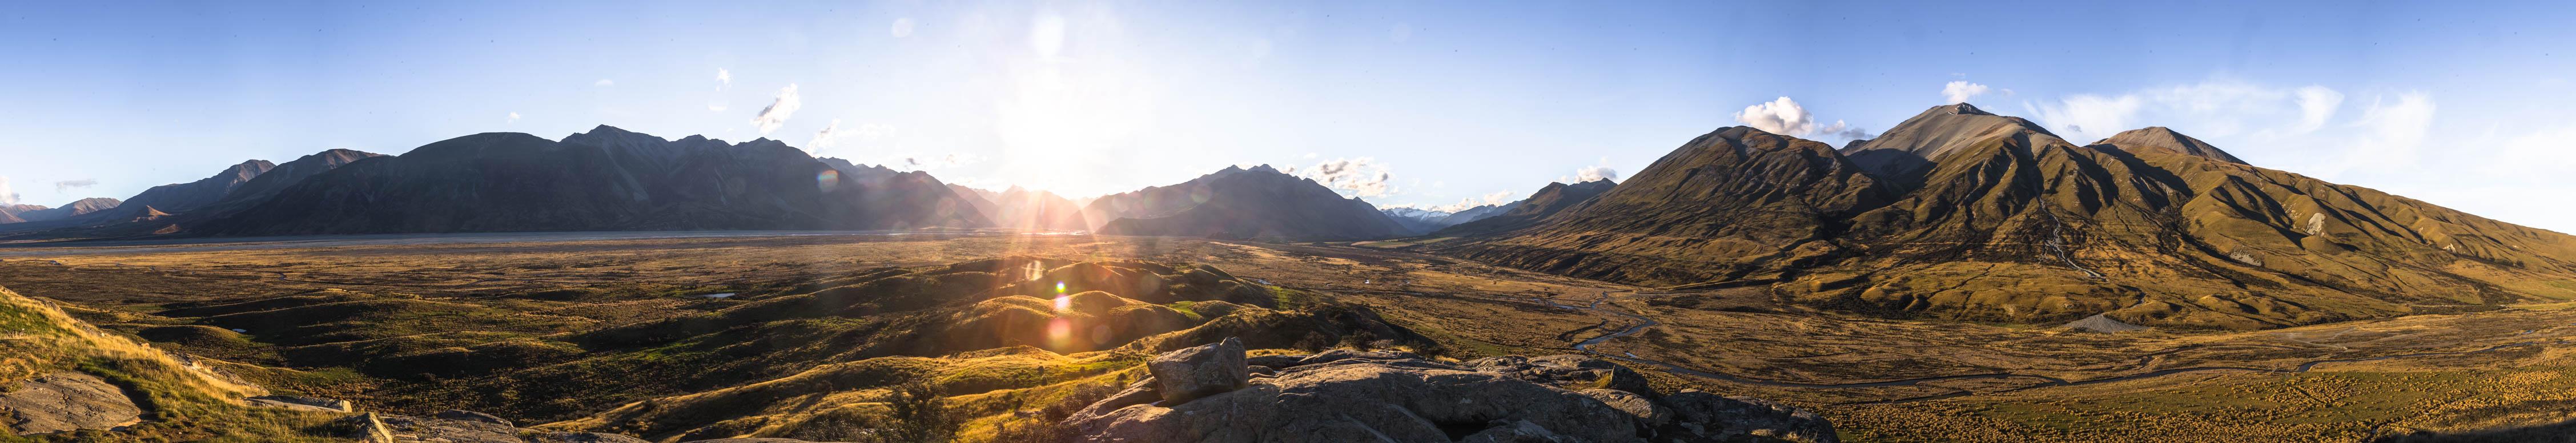 Der Sonnenuntergang im Erewhon Tal